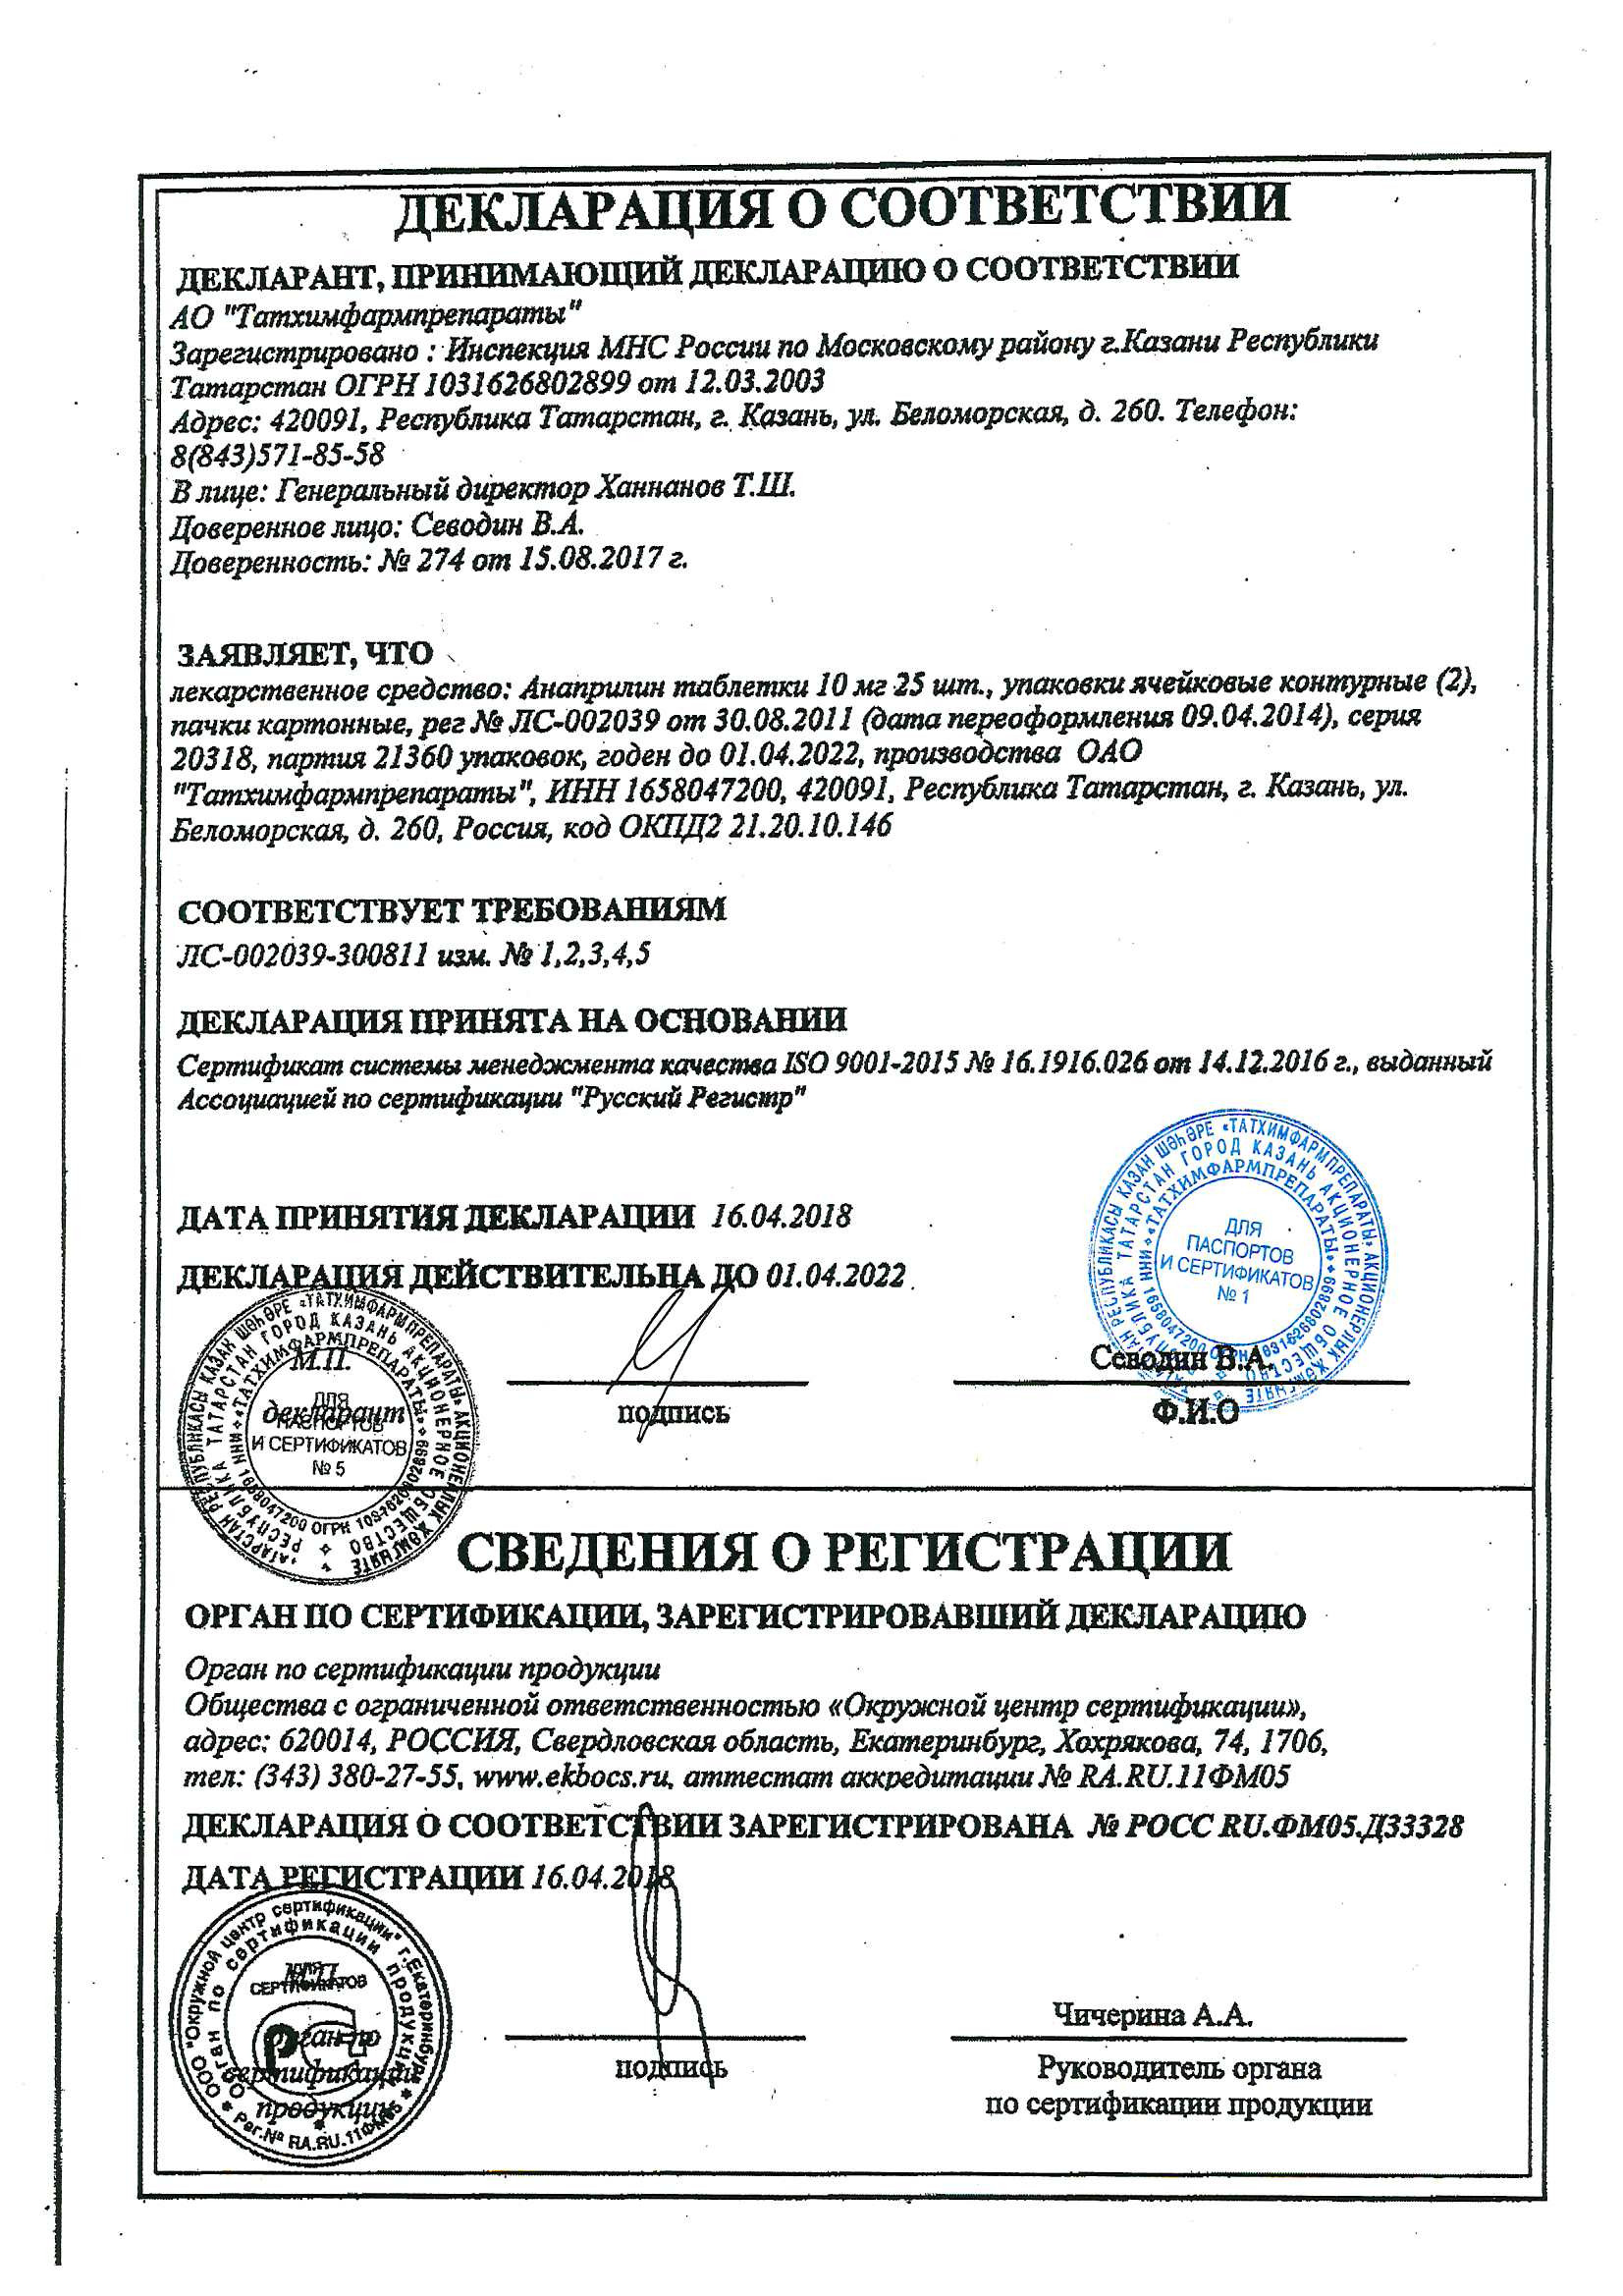 https://avisfarm.com/i/lek/certificates/77721411/36500-01302005.jpg?id=49